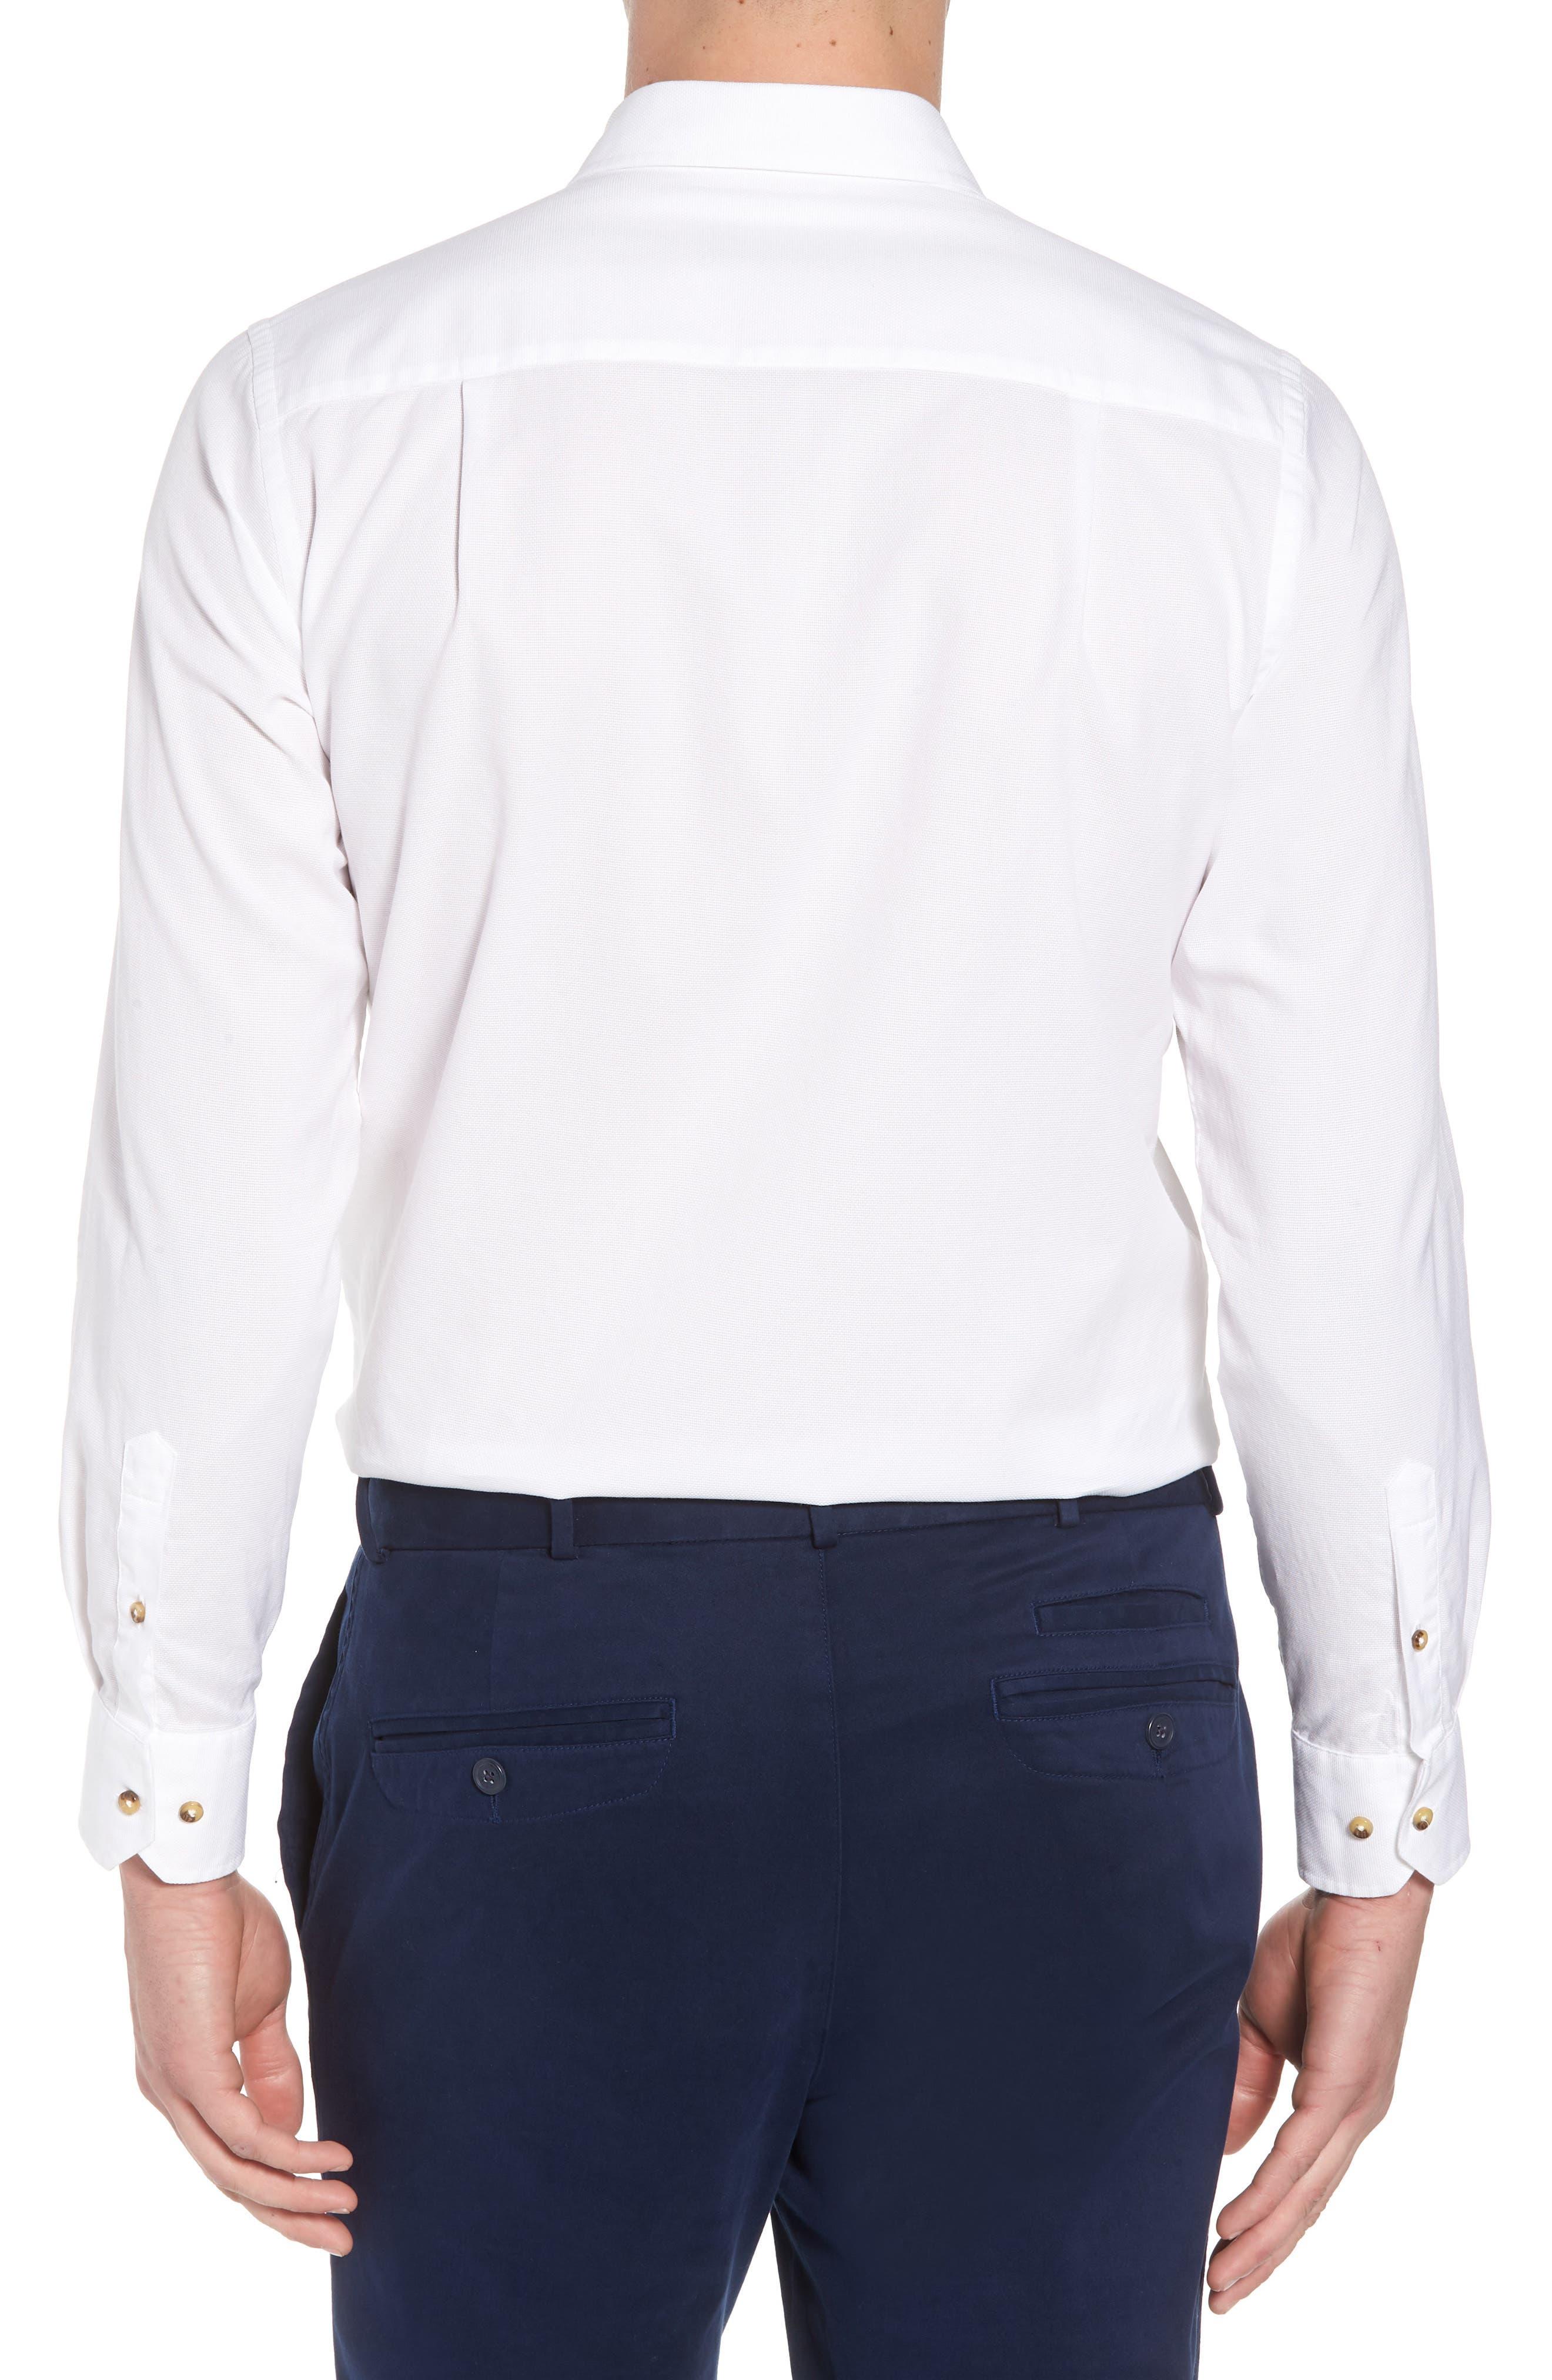 Regular Fit Garment Washed Sport Shirt,                             Alternate thumbnail 2, color,                             White